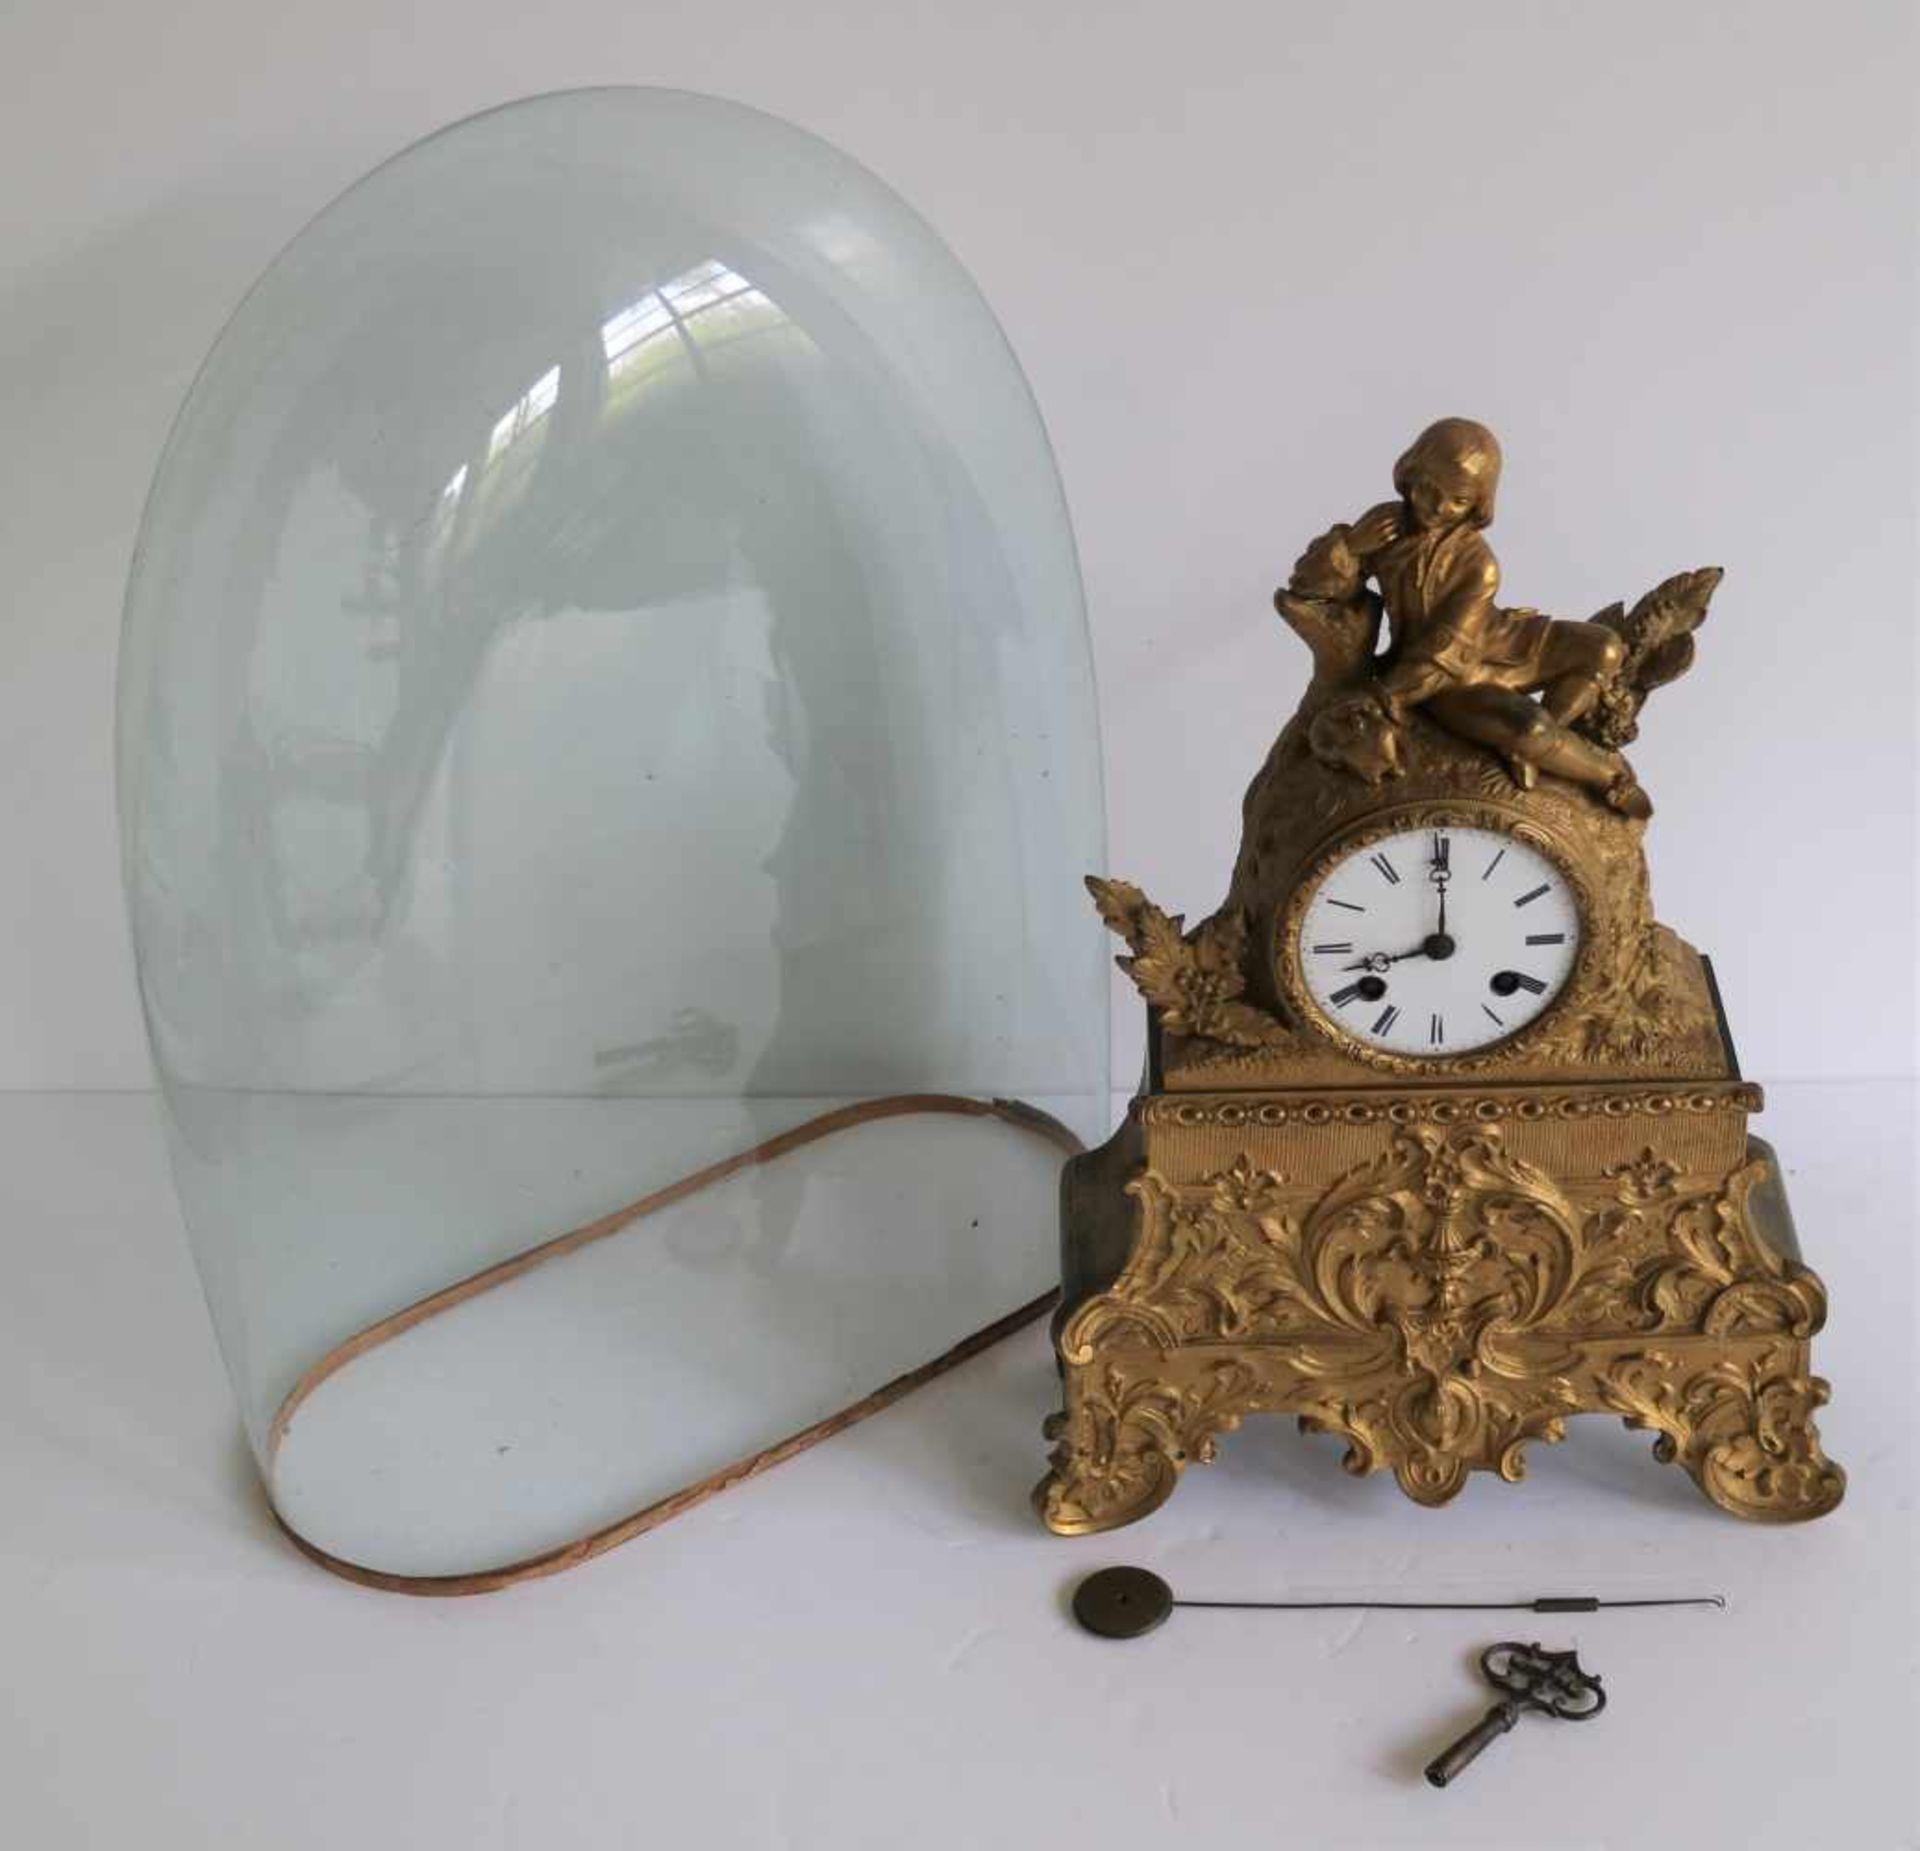 Los 85 - Louis Philippe clock under glass bell jar and artificial bronze H 35 en 42 cm